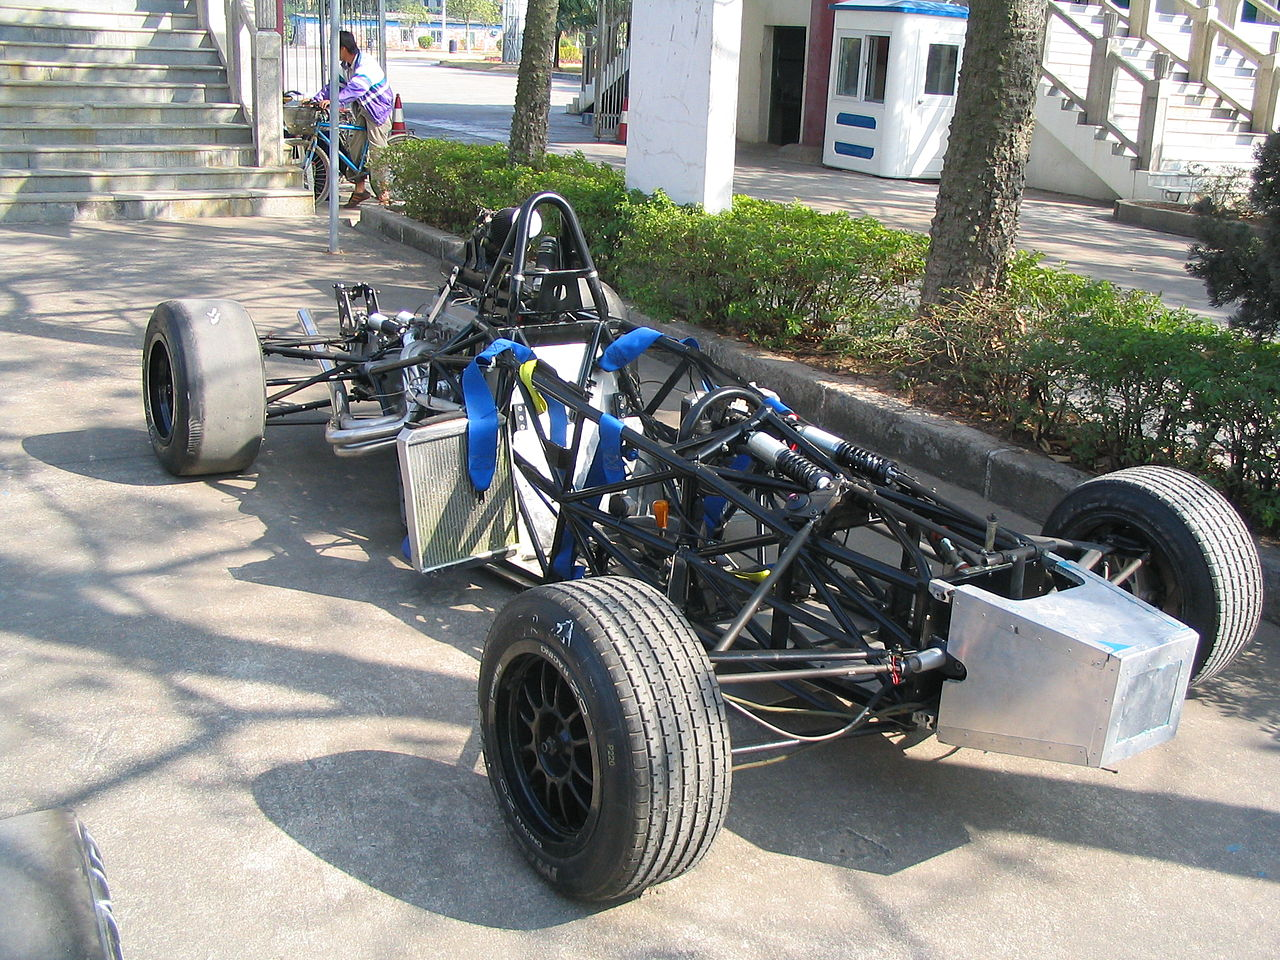 Conversion Vehicle Race Cars